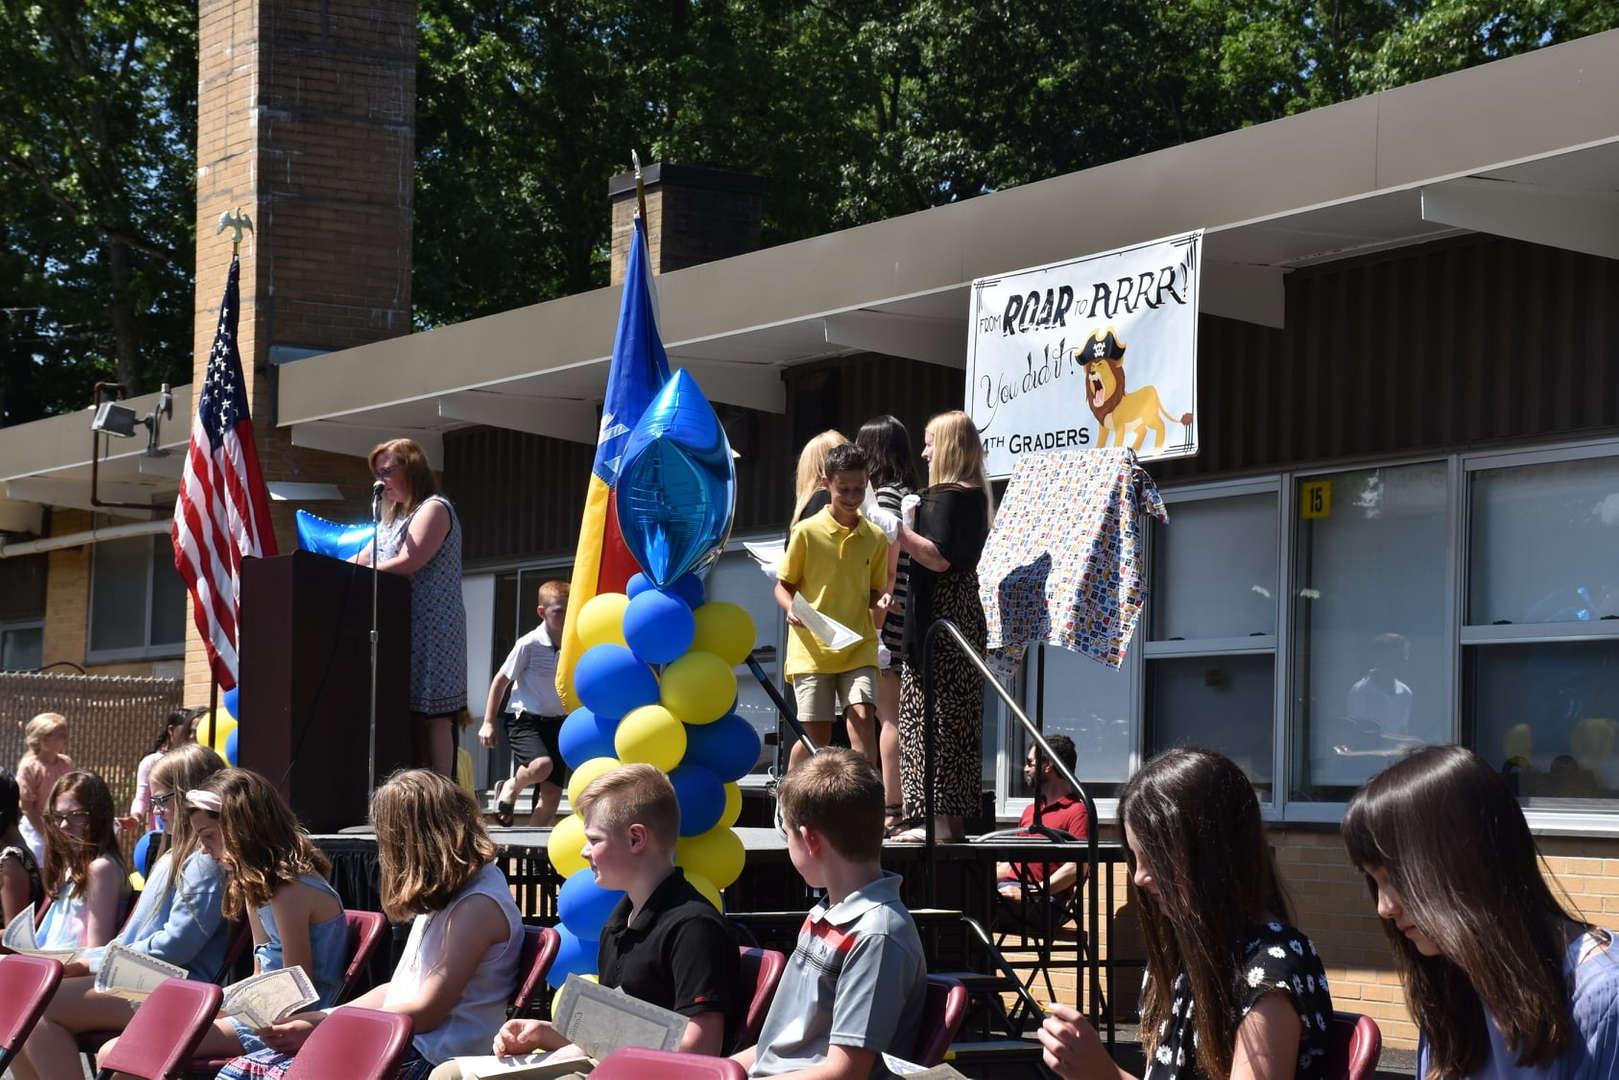 Lincoln Avenue Grade 4 Promotion Ceremony held 6/15/21